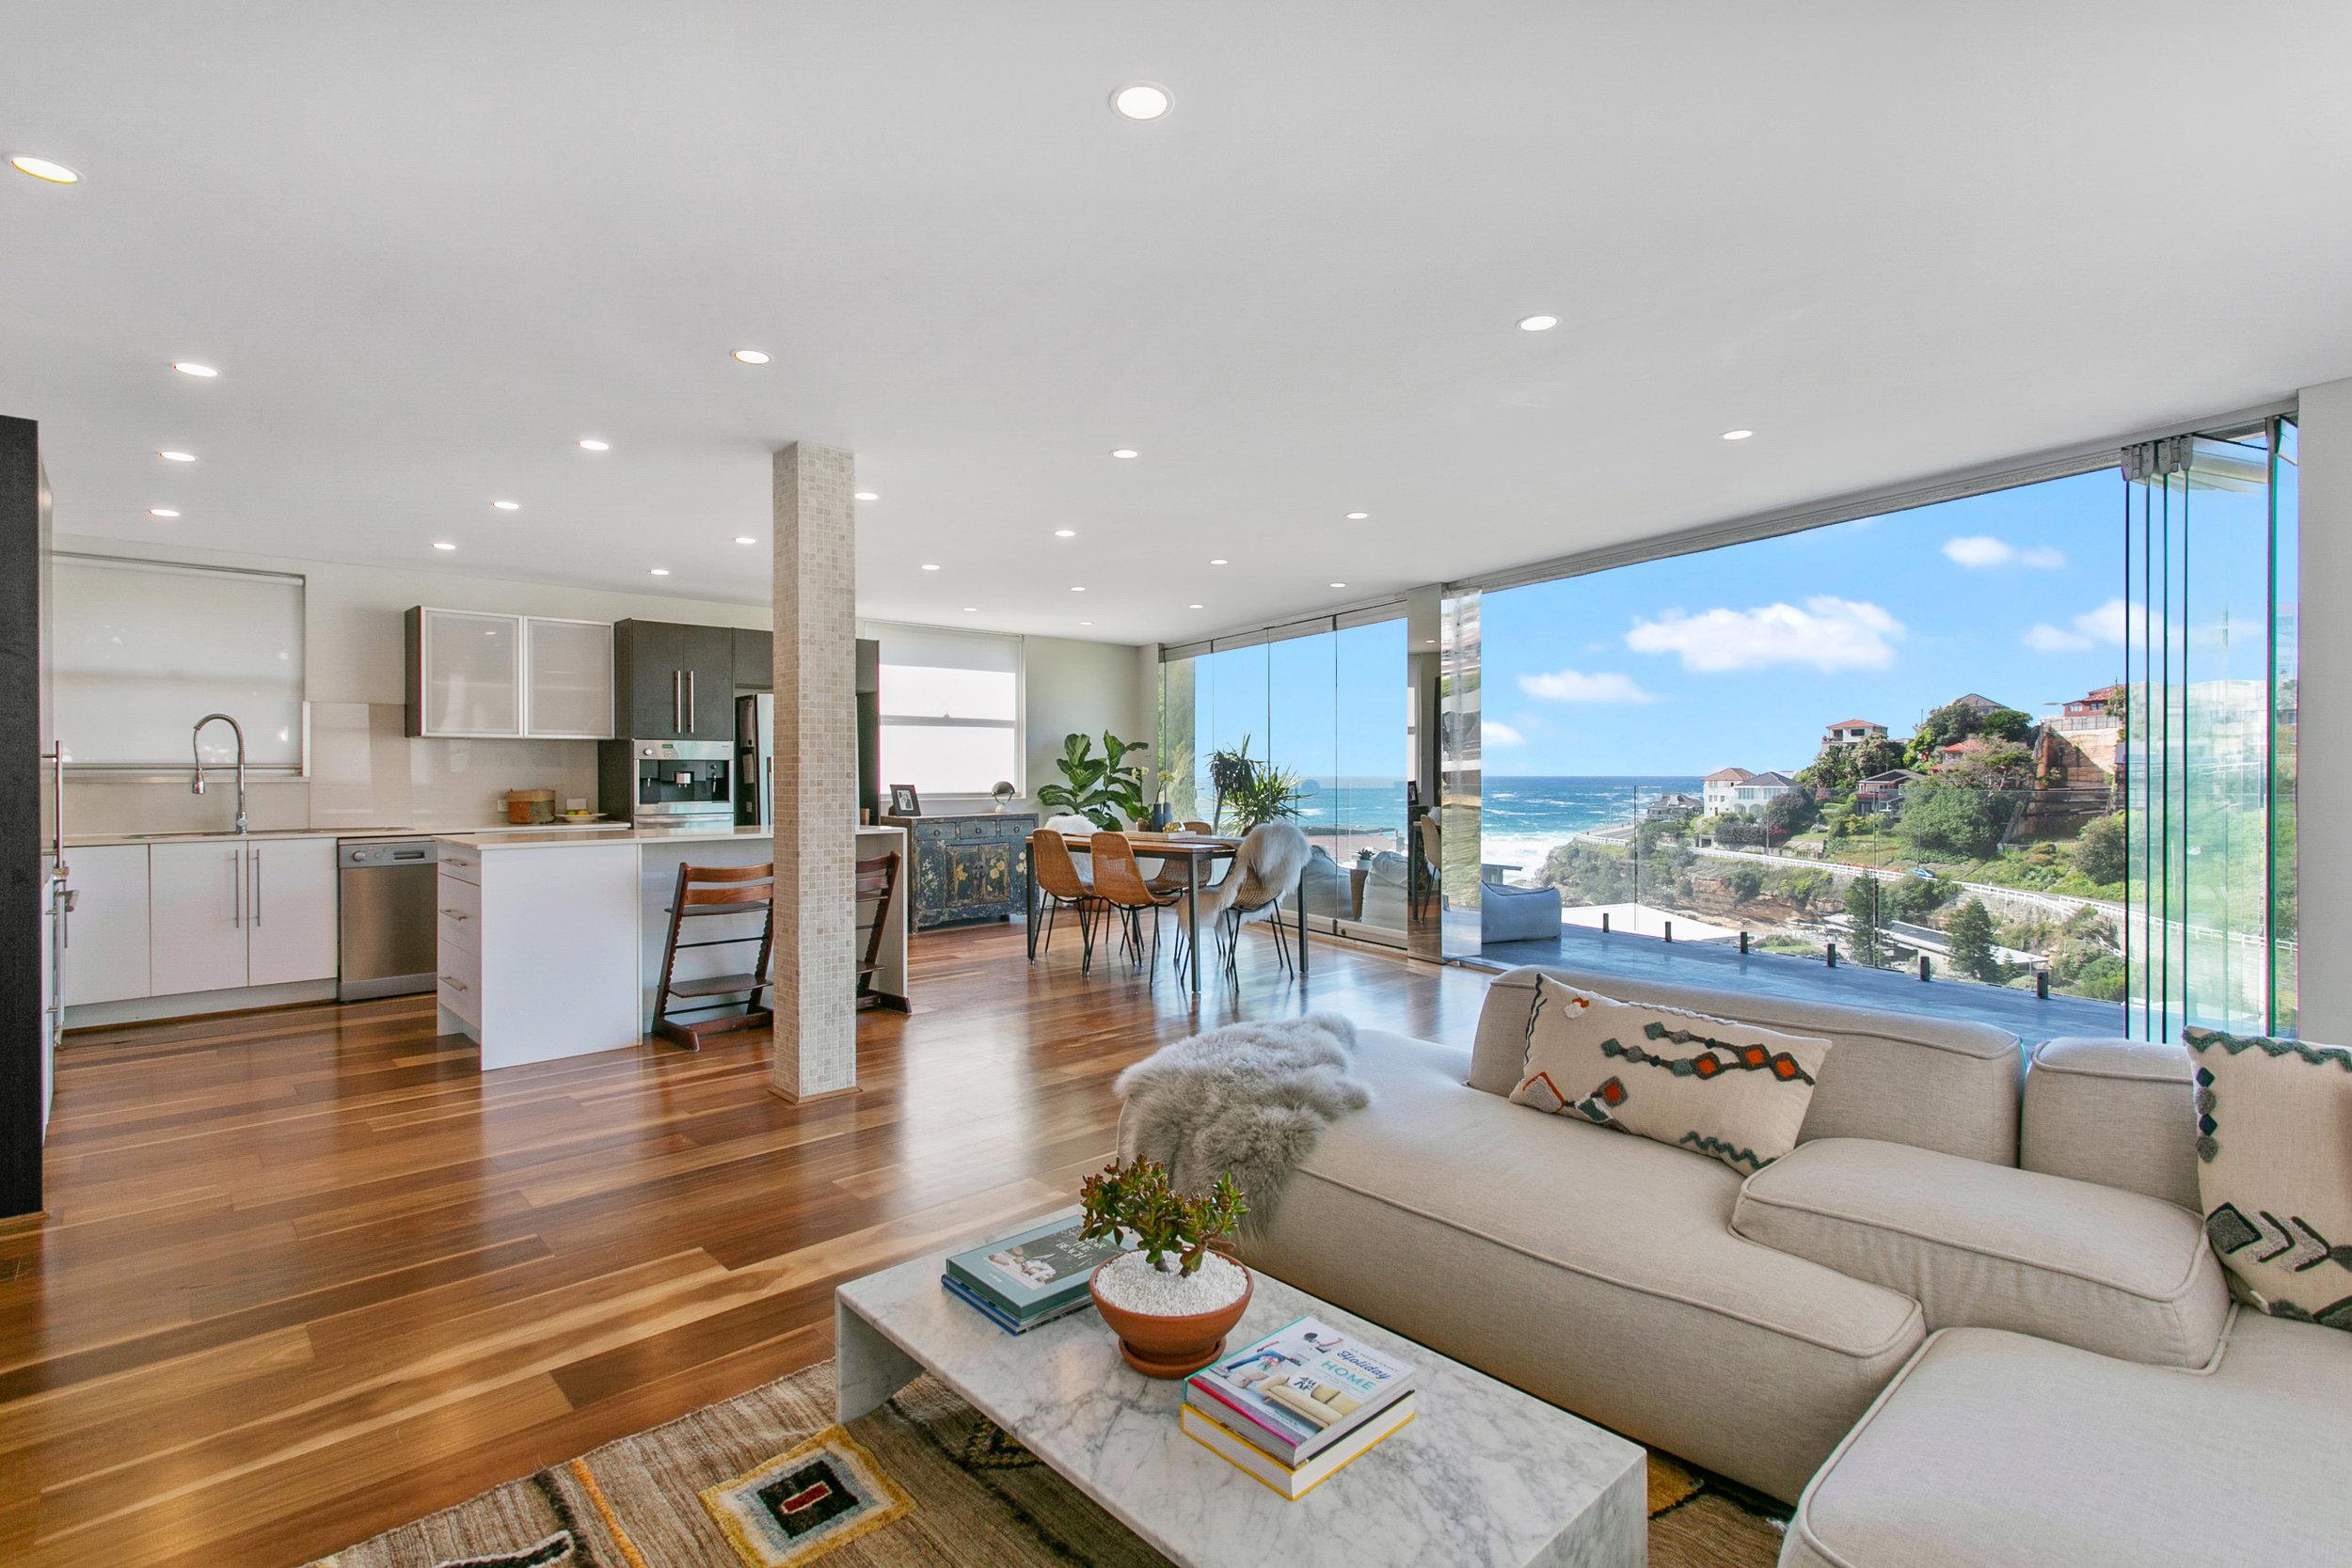 The Penthouse Tamarama ocean view. Bondi Beach Holiday Homes1.jpg